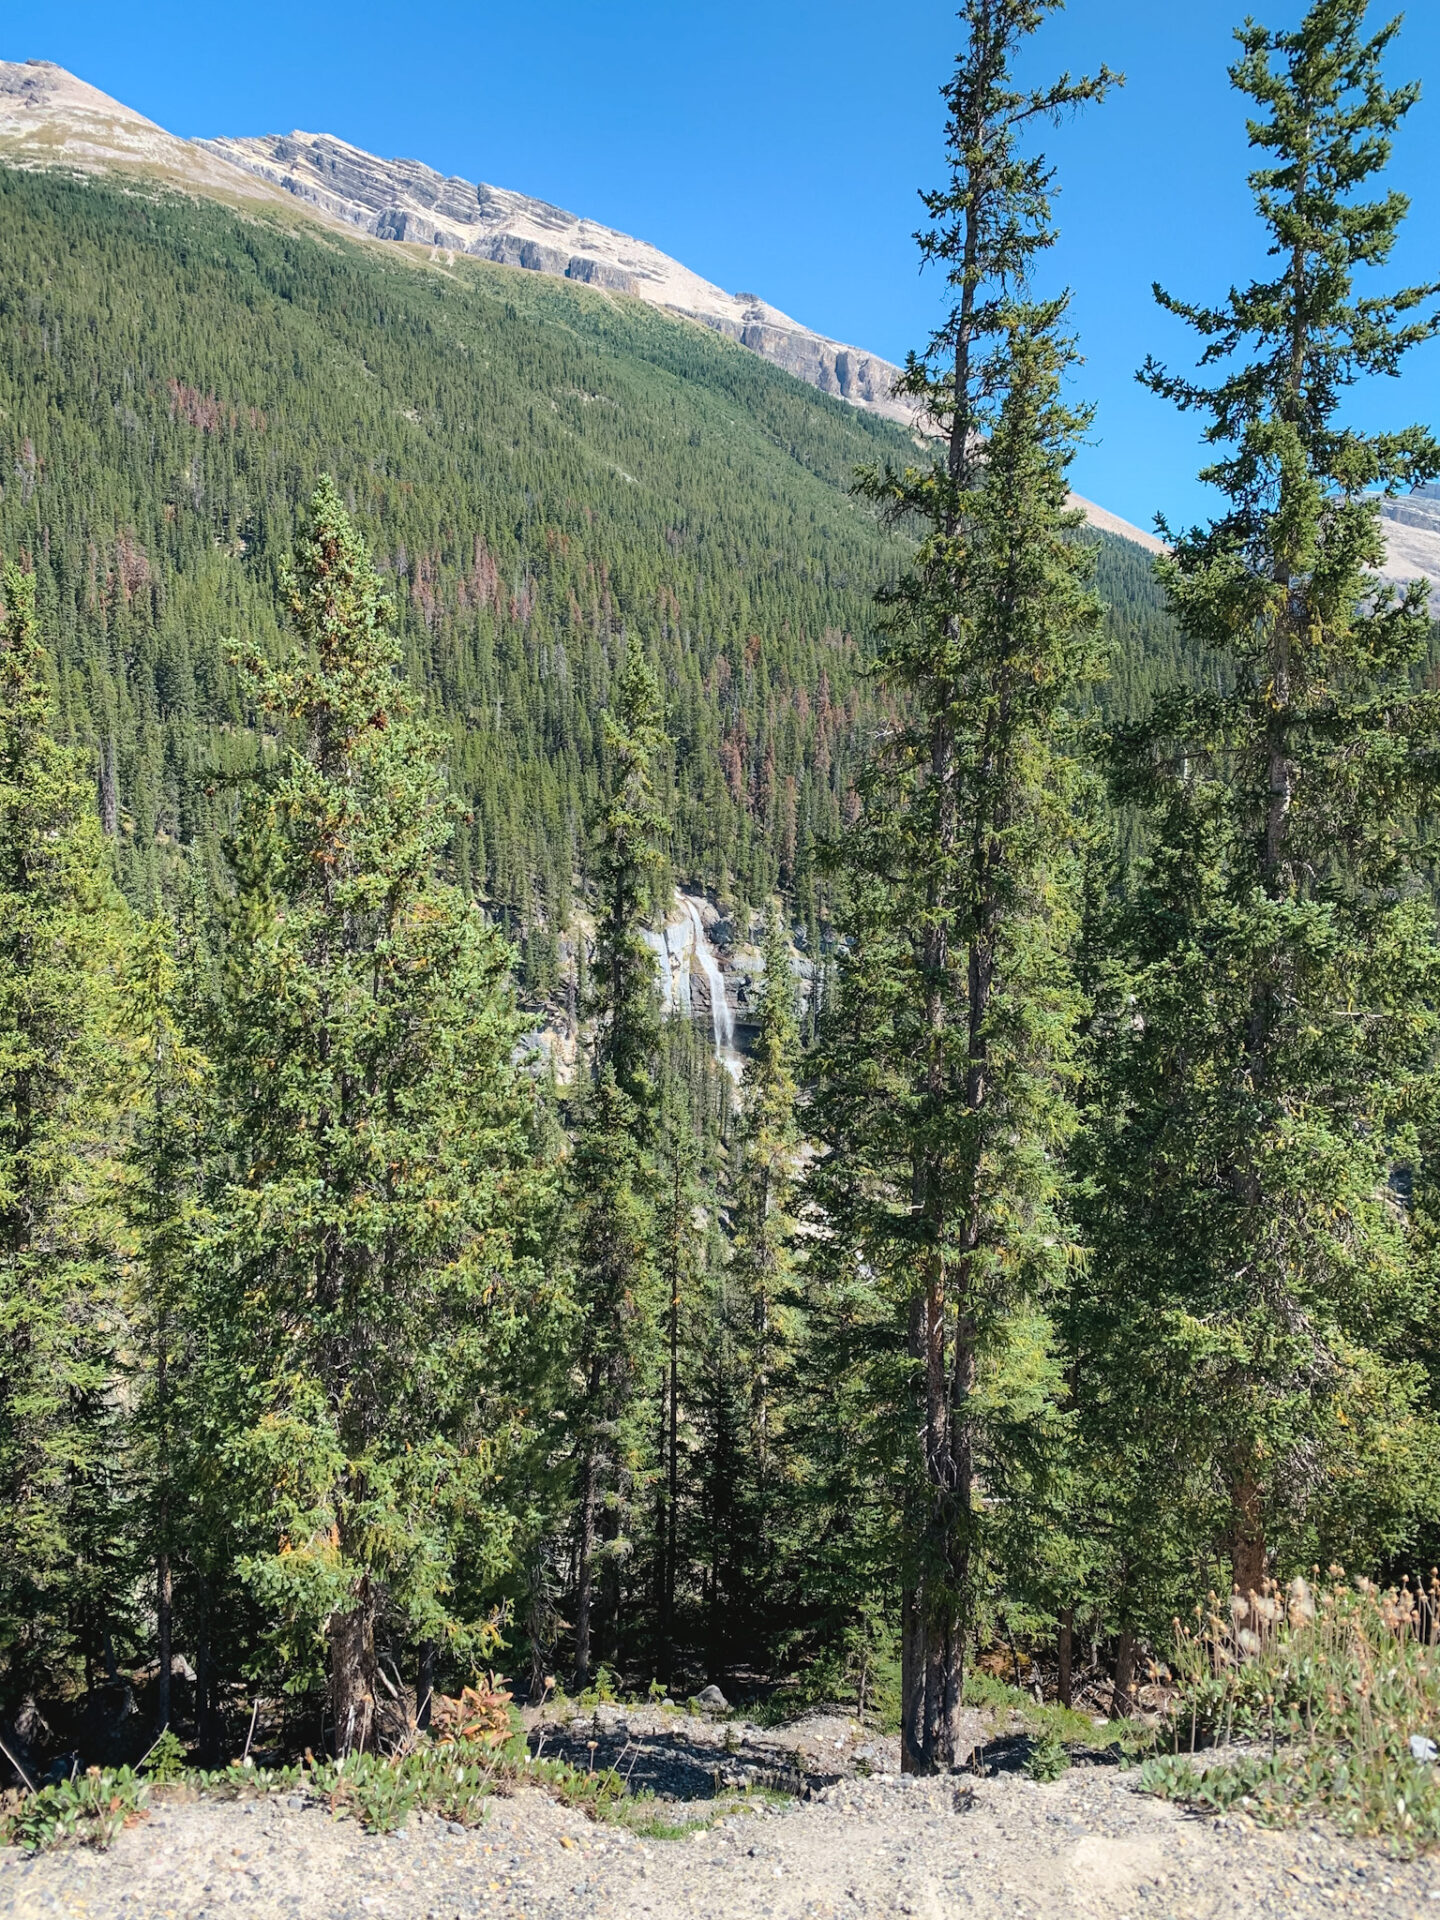 Bridal Veil Falls in Banff, Alberta